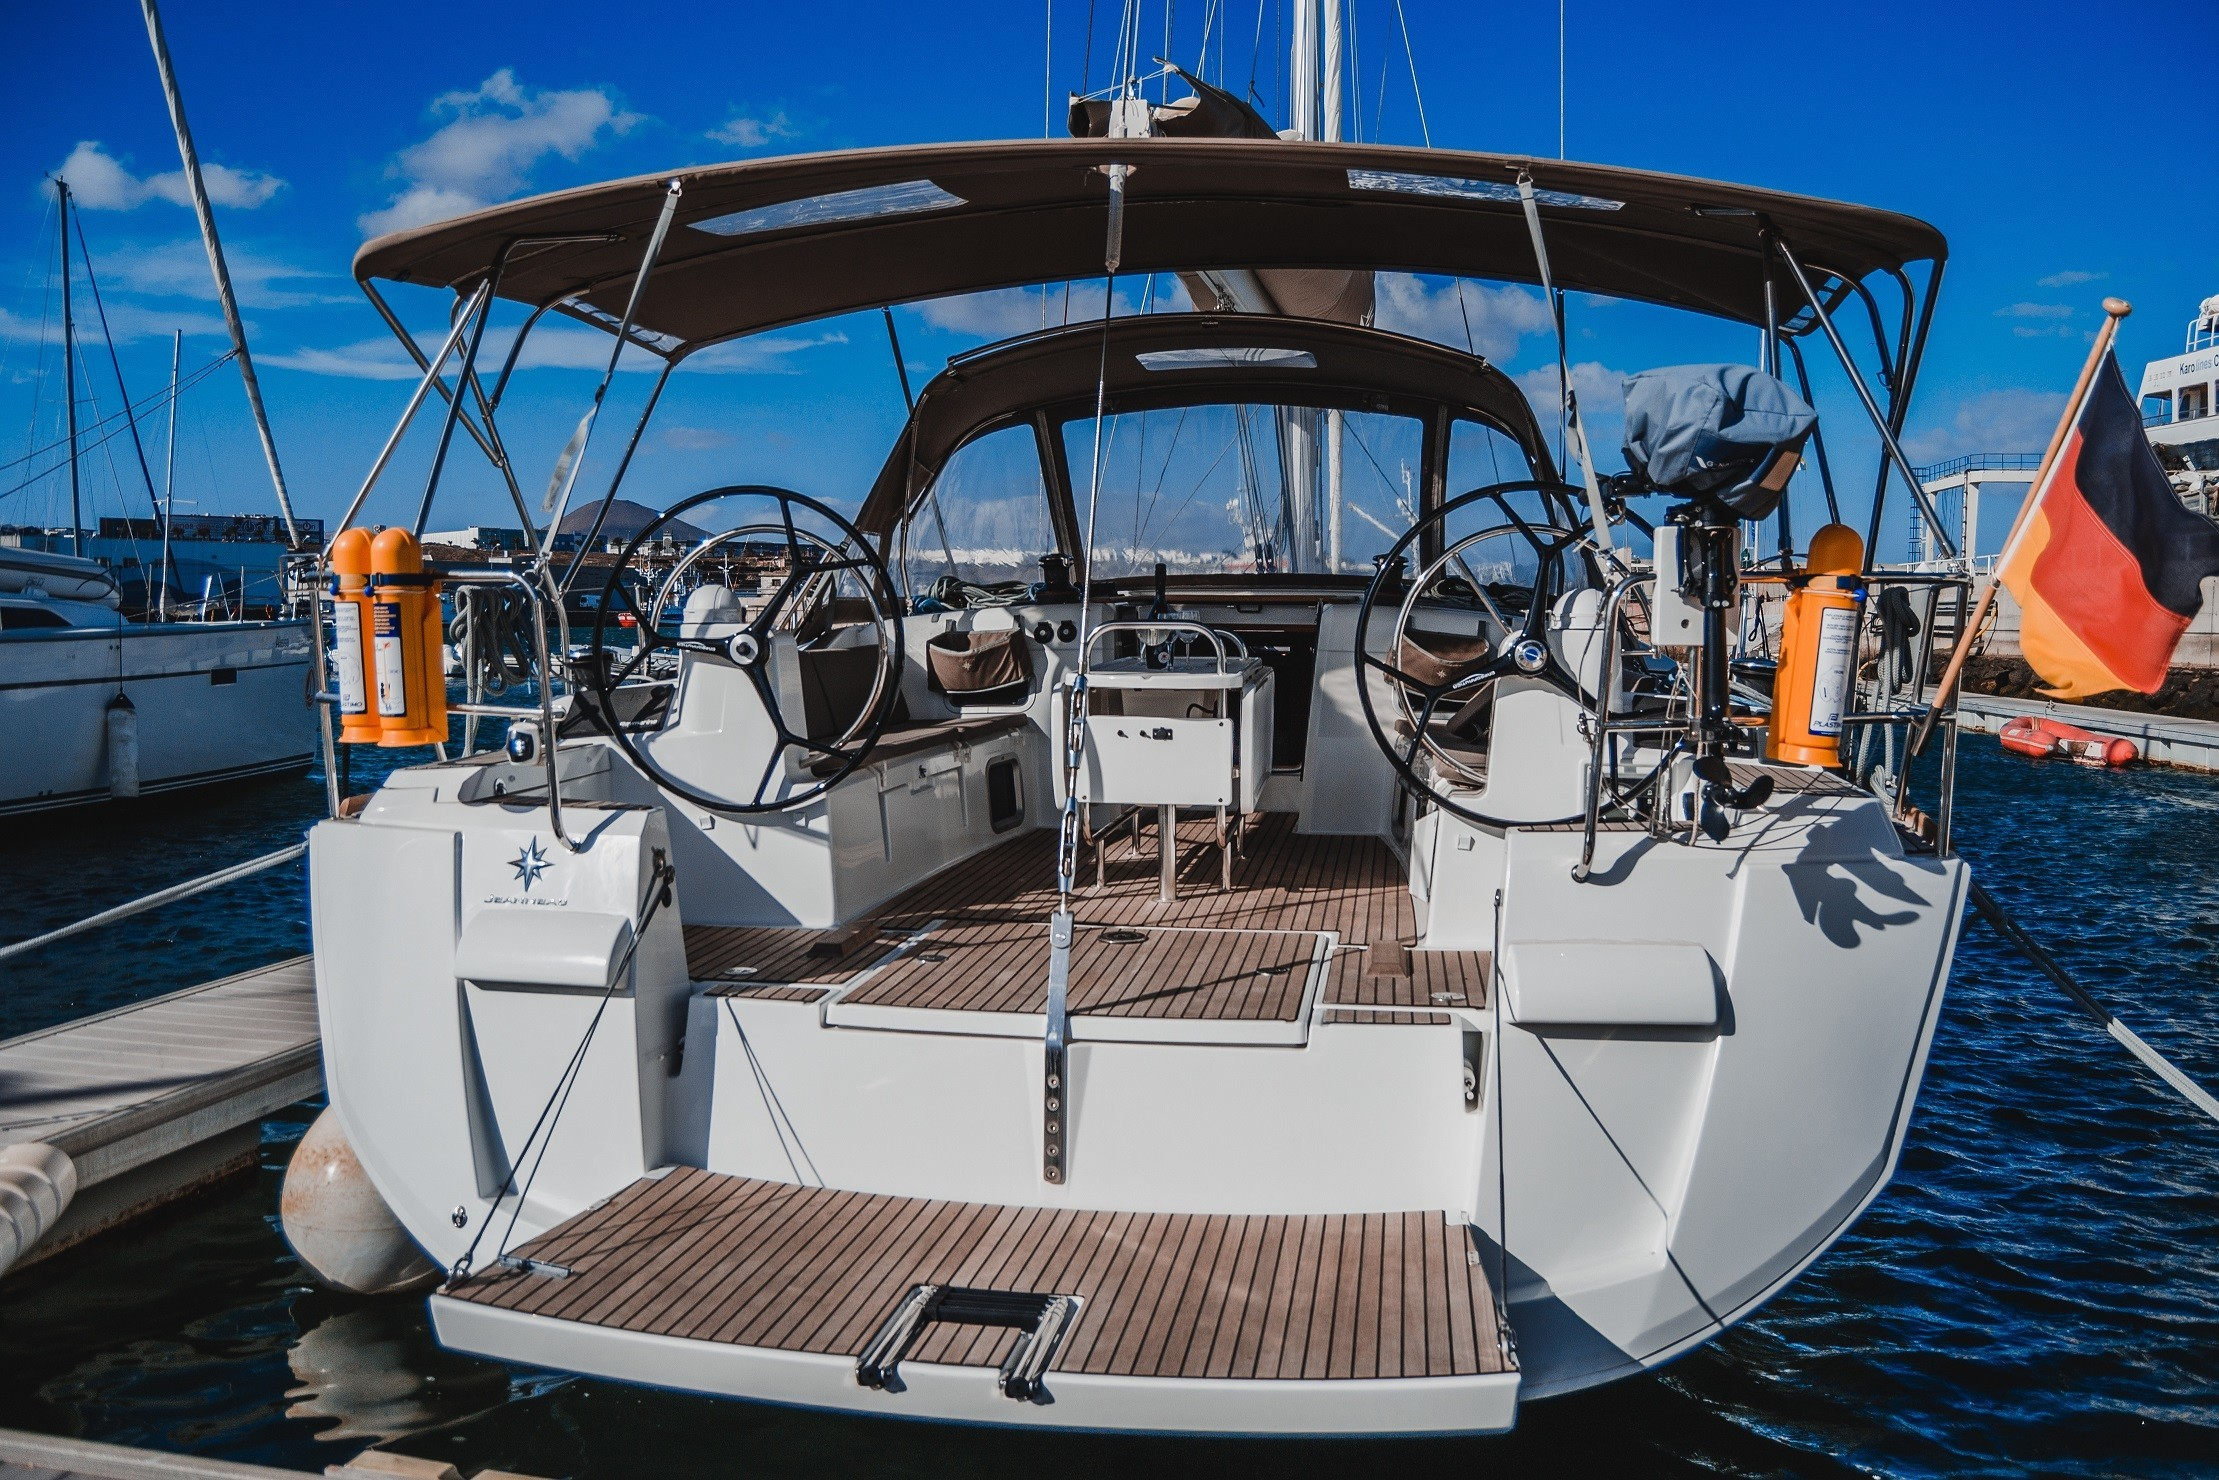 Jeanneau Sun Odyssey 519 La Flaca at Marina Lanzarote